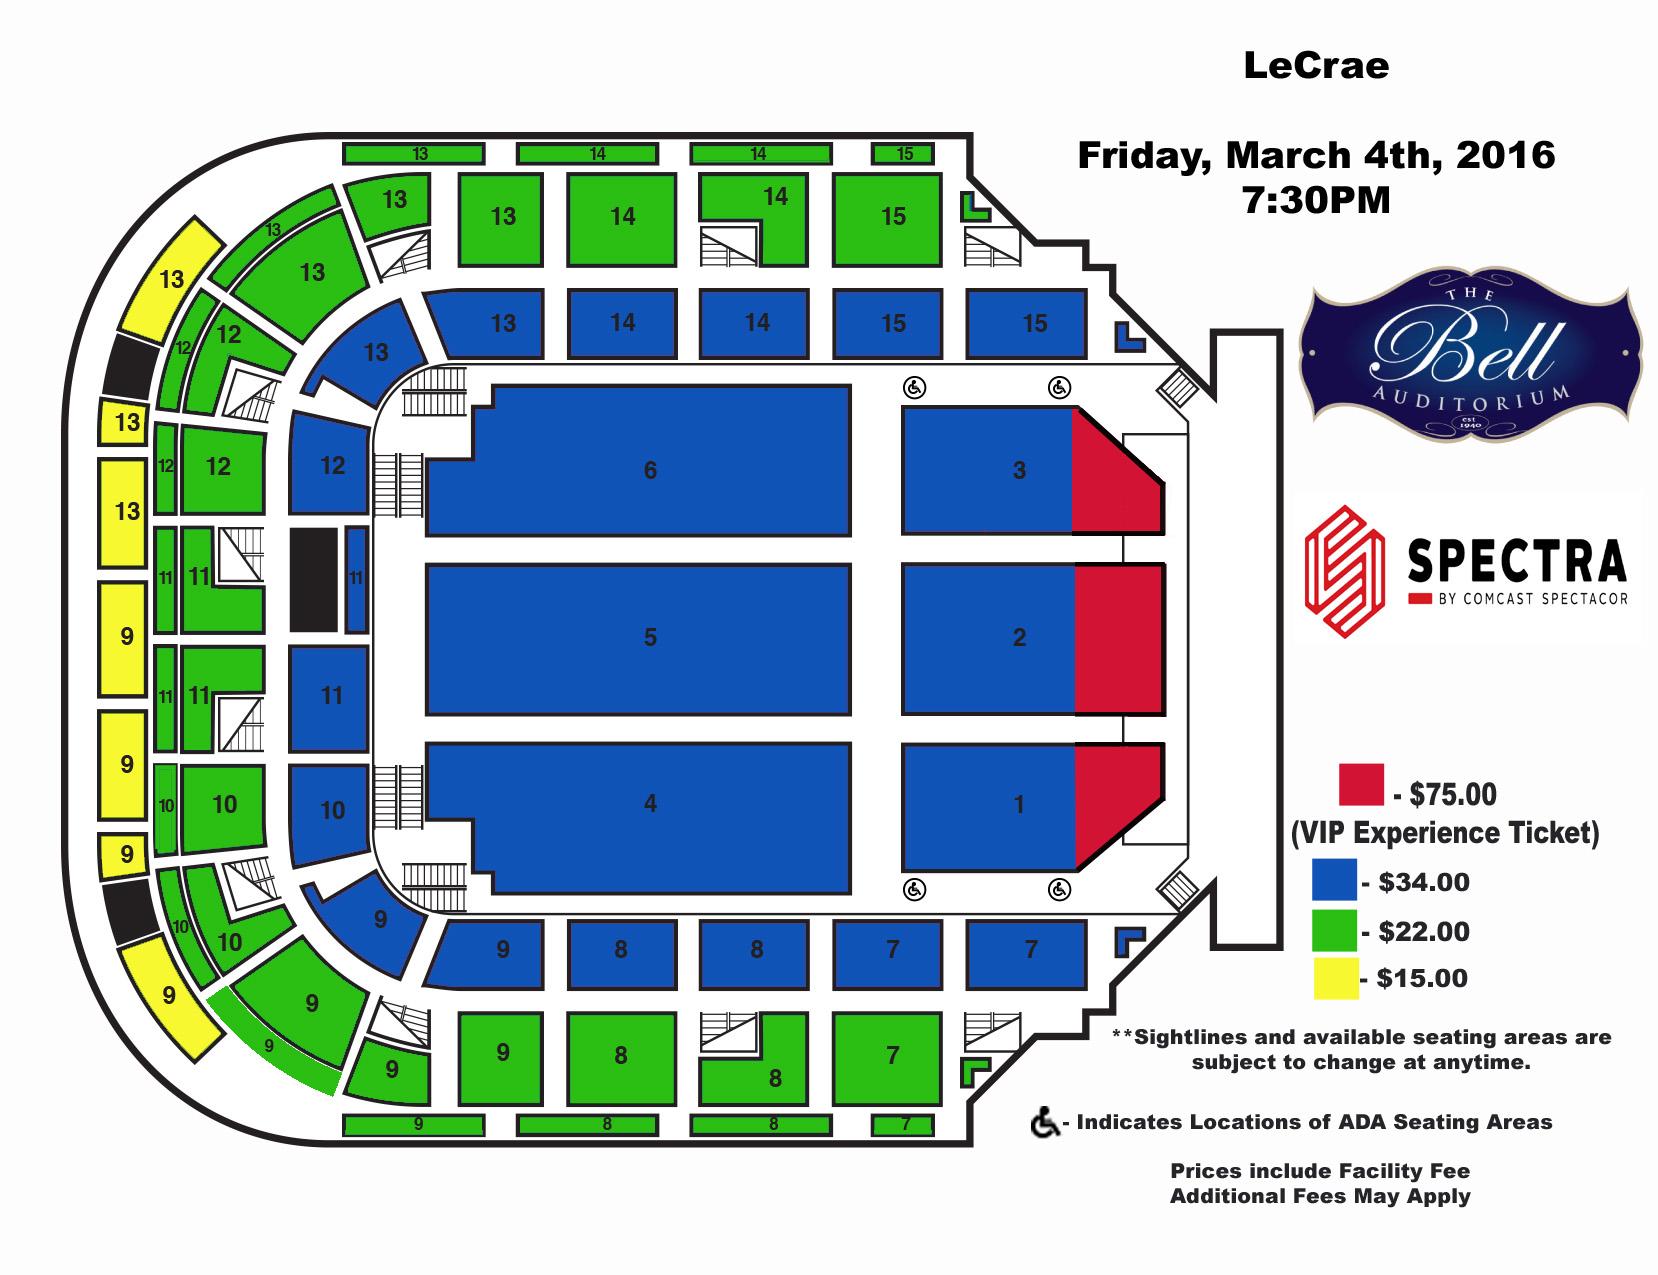 Venues - James Brown Arena - Bell Auditorium